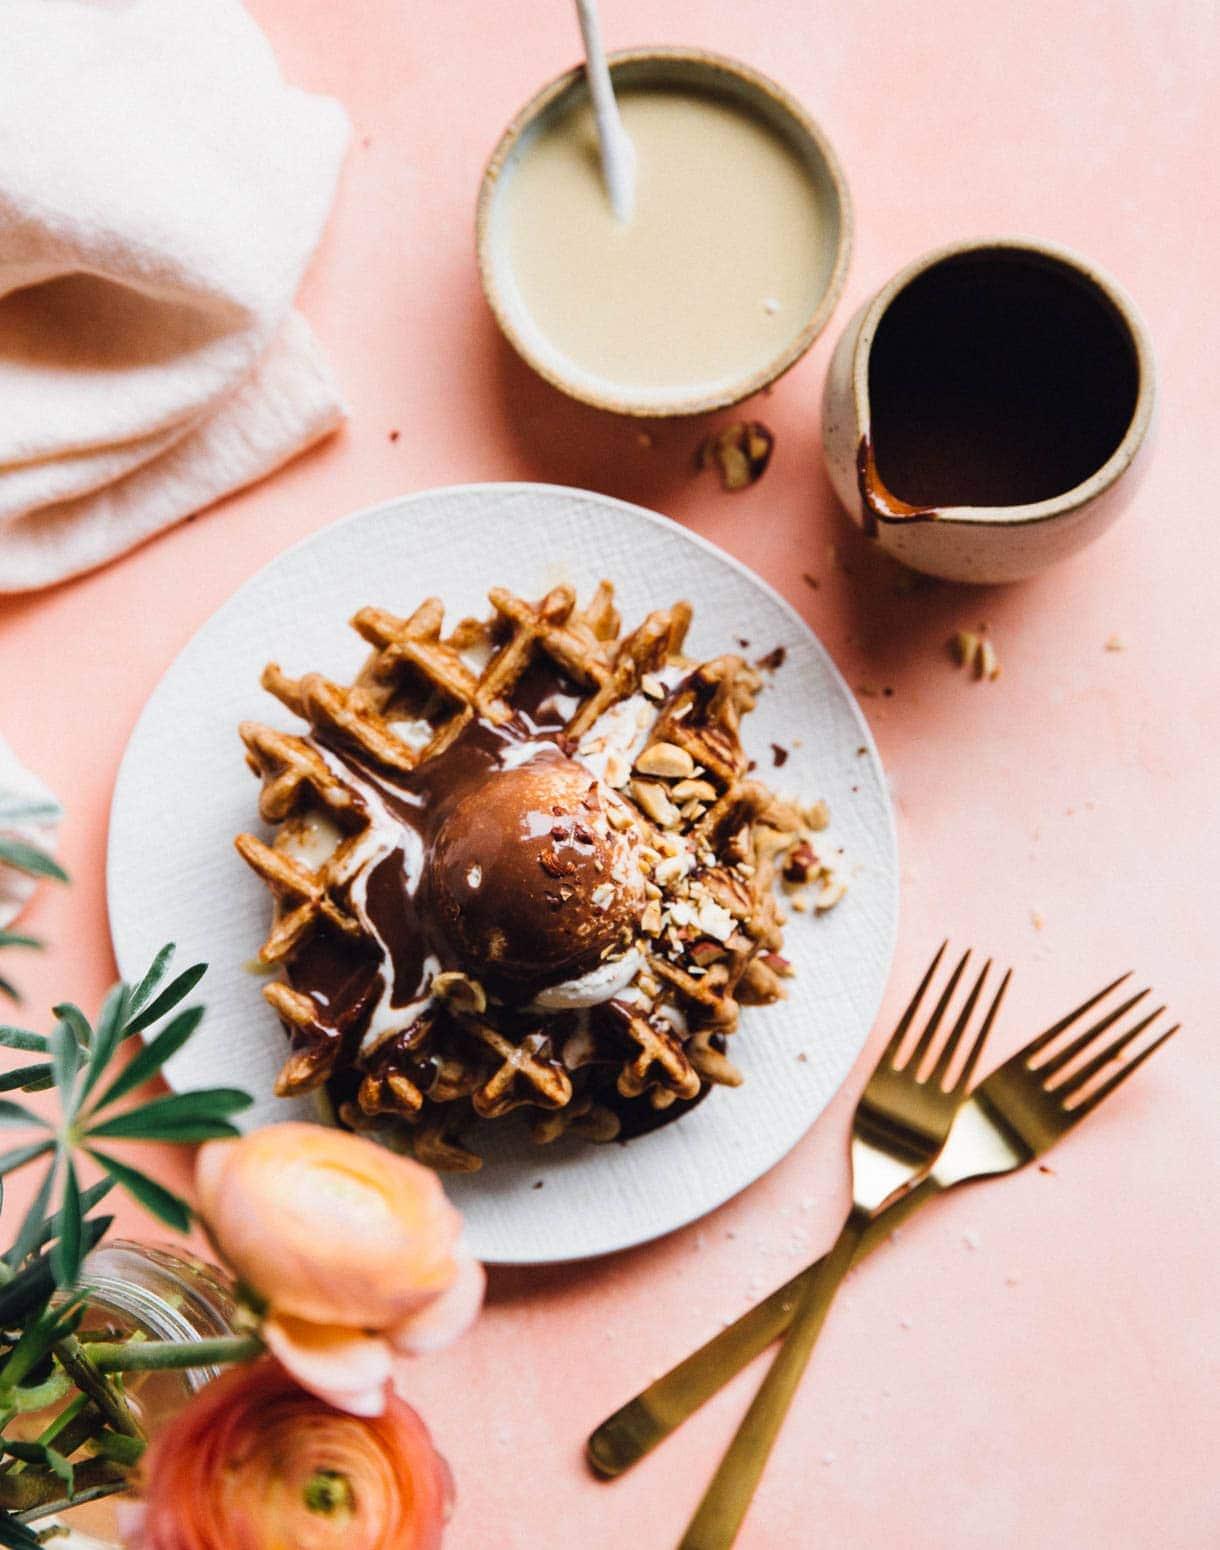 Fluffy Waffle Recipe, as an Ice Cream Sundae